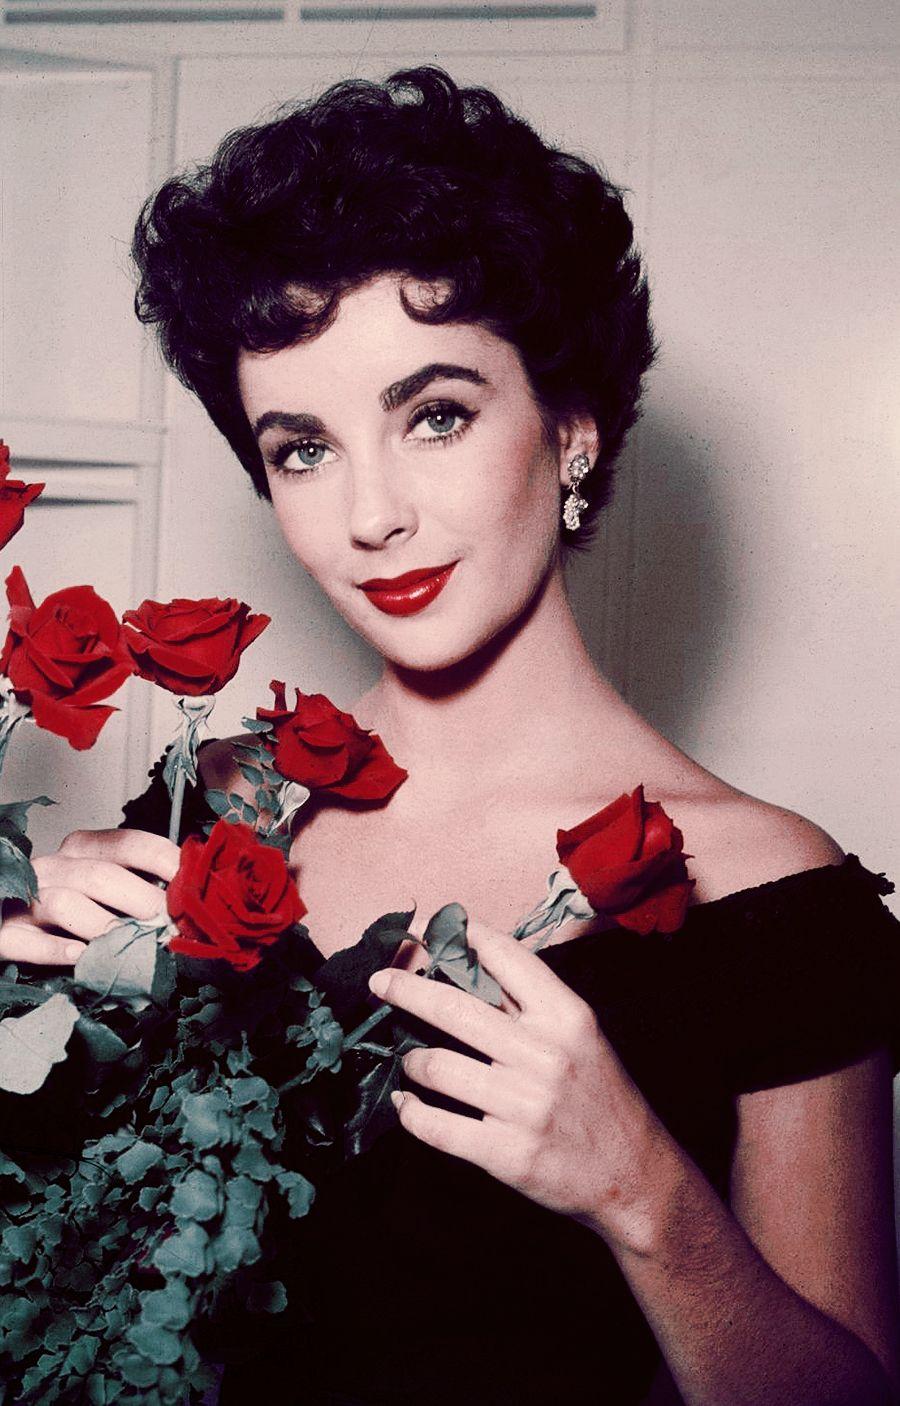 Elizabeth Taylor arranging a bouquet of red roses, 1953 ...